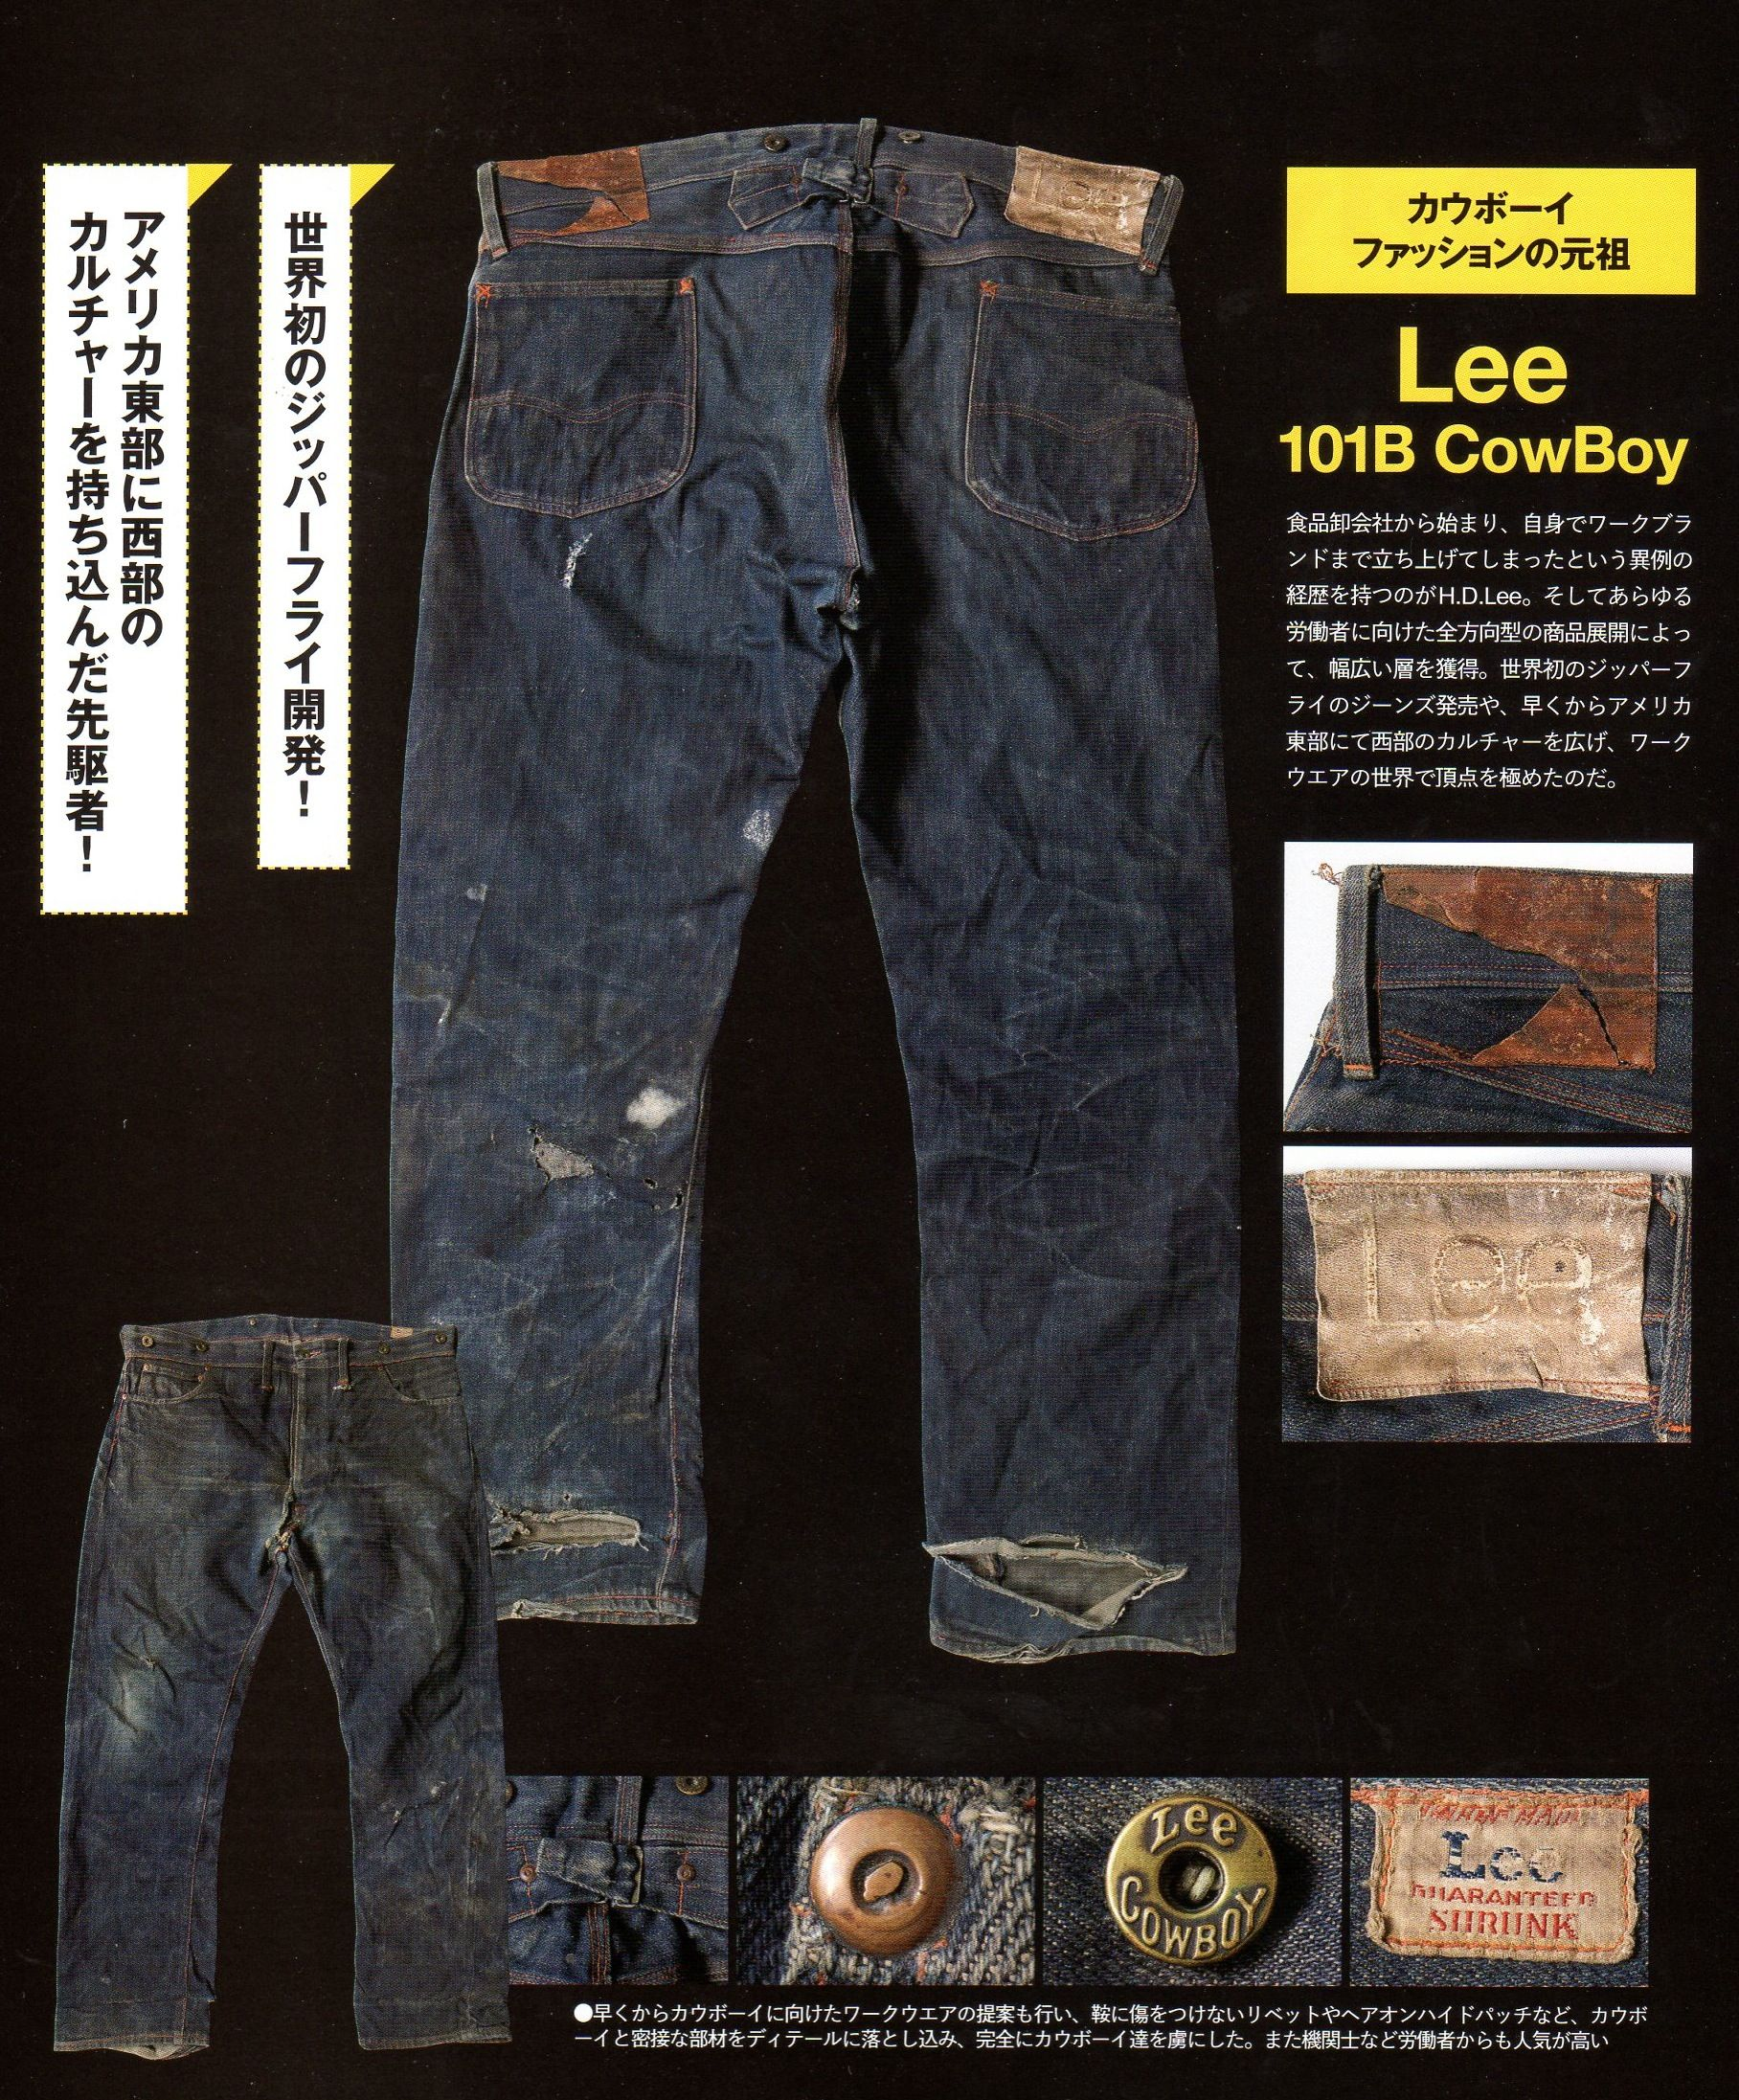 7fdf8910ab25 Lee Lot 101B Cowboy Pants